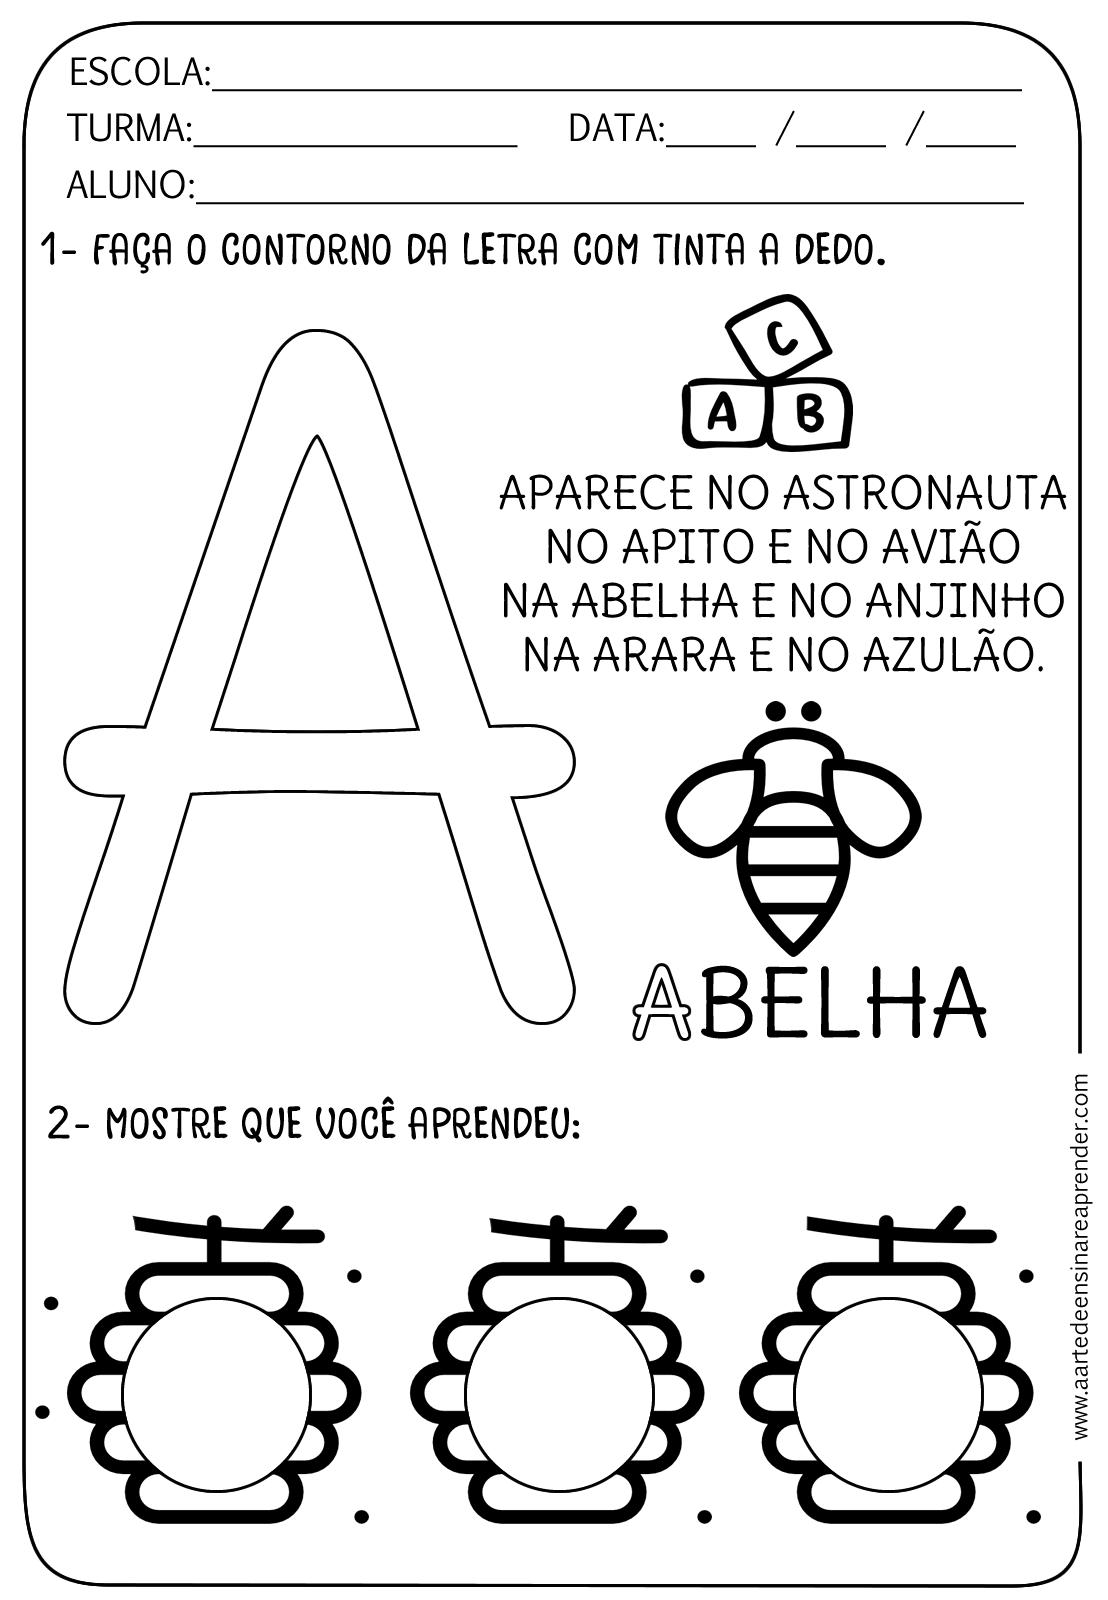 Favoritos Atividade pronta - Alfabeto: Letra A - A Arte de Ensinar e Aprender TA66